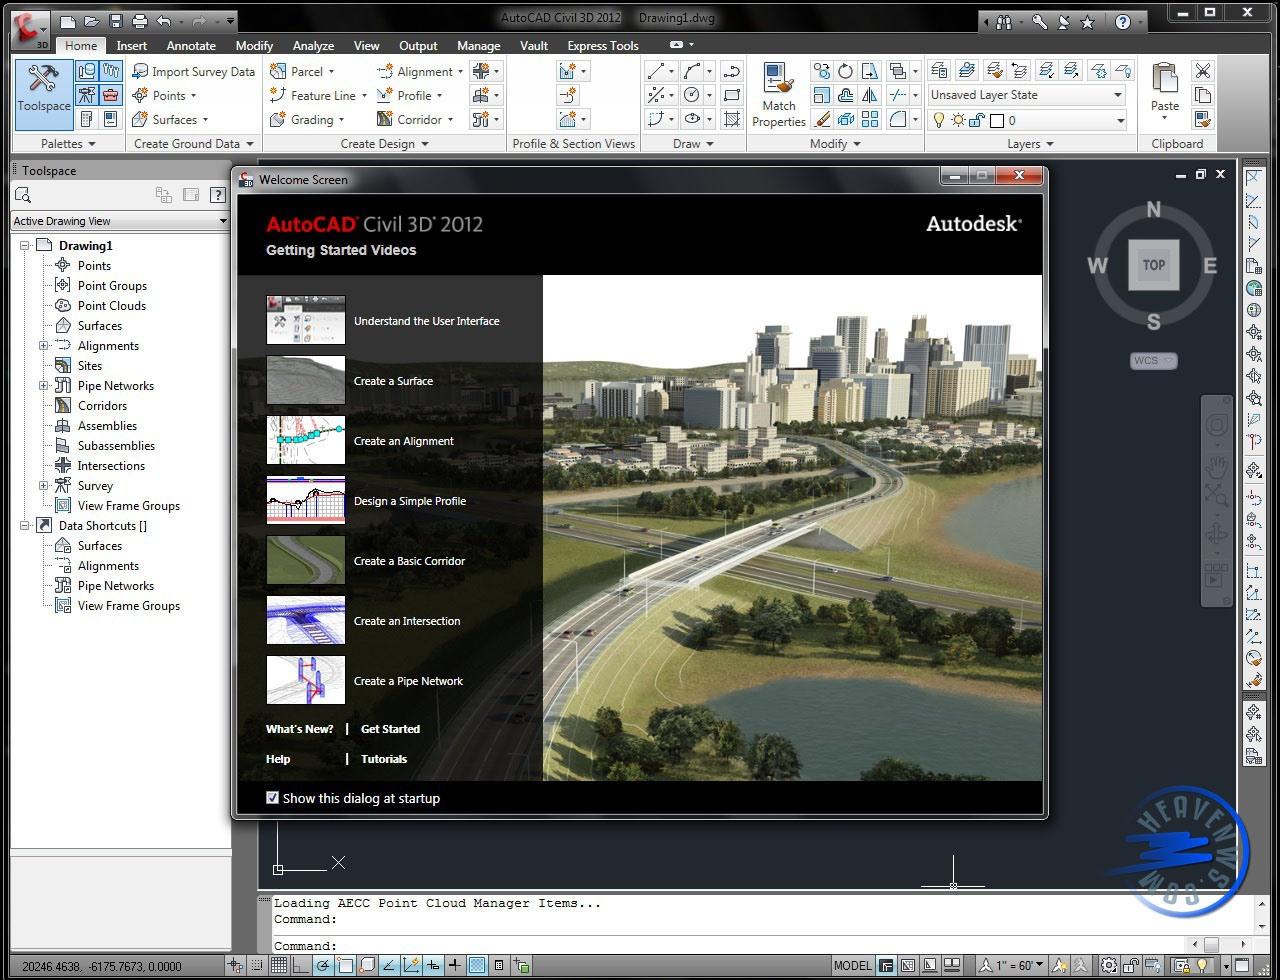 Buy Autodesk AutoCad Civil 3D 2012 key